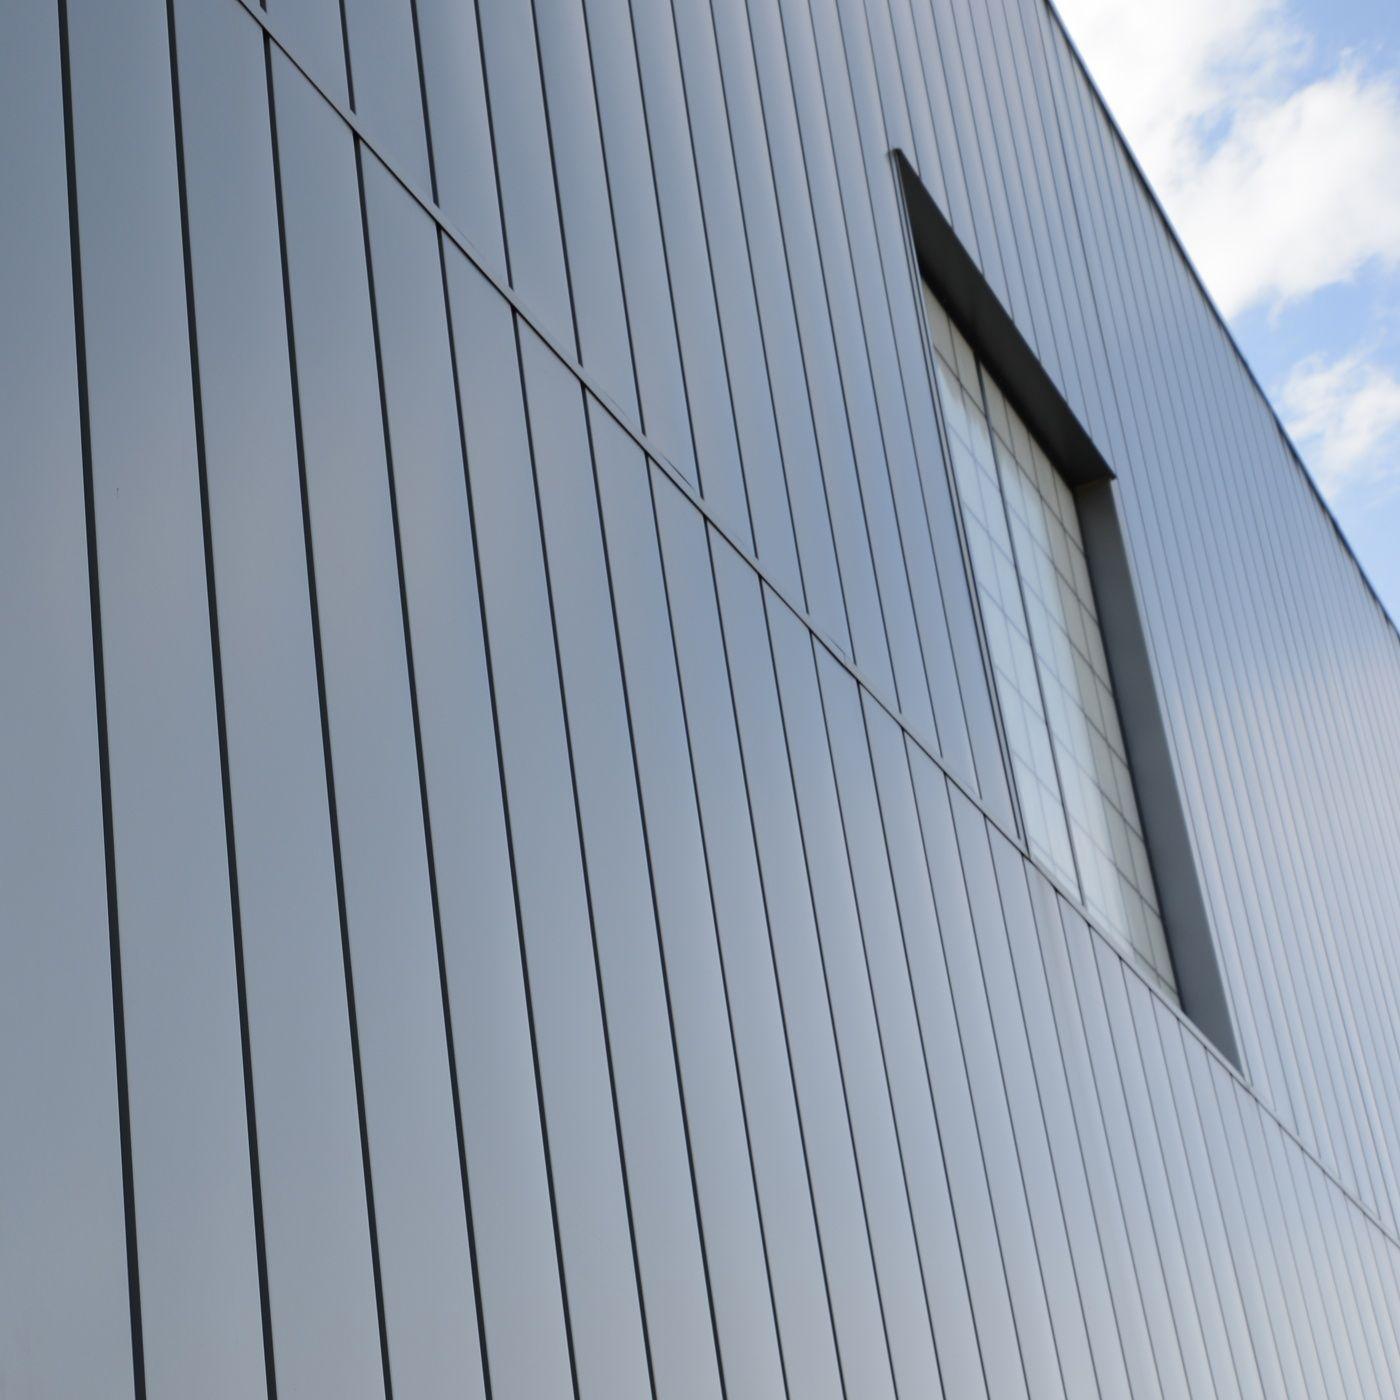 Vertical Flat Metal Wall Panel Metal Siding Exterior Wall Panels Metal Wall Panel